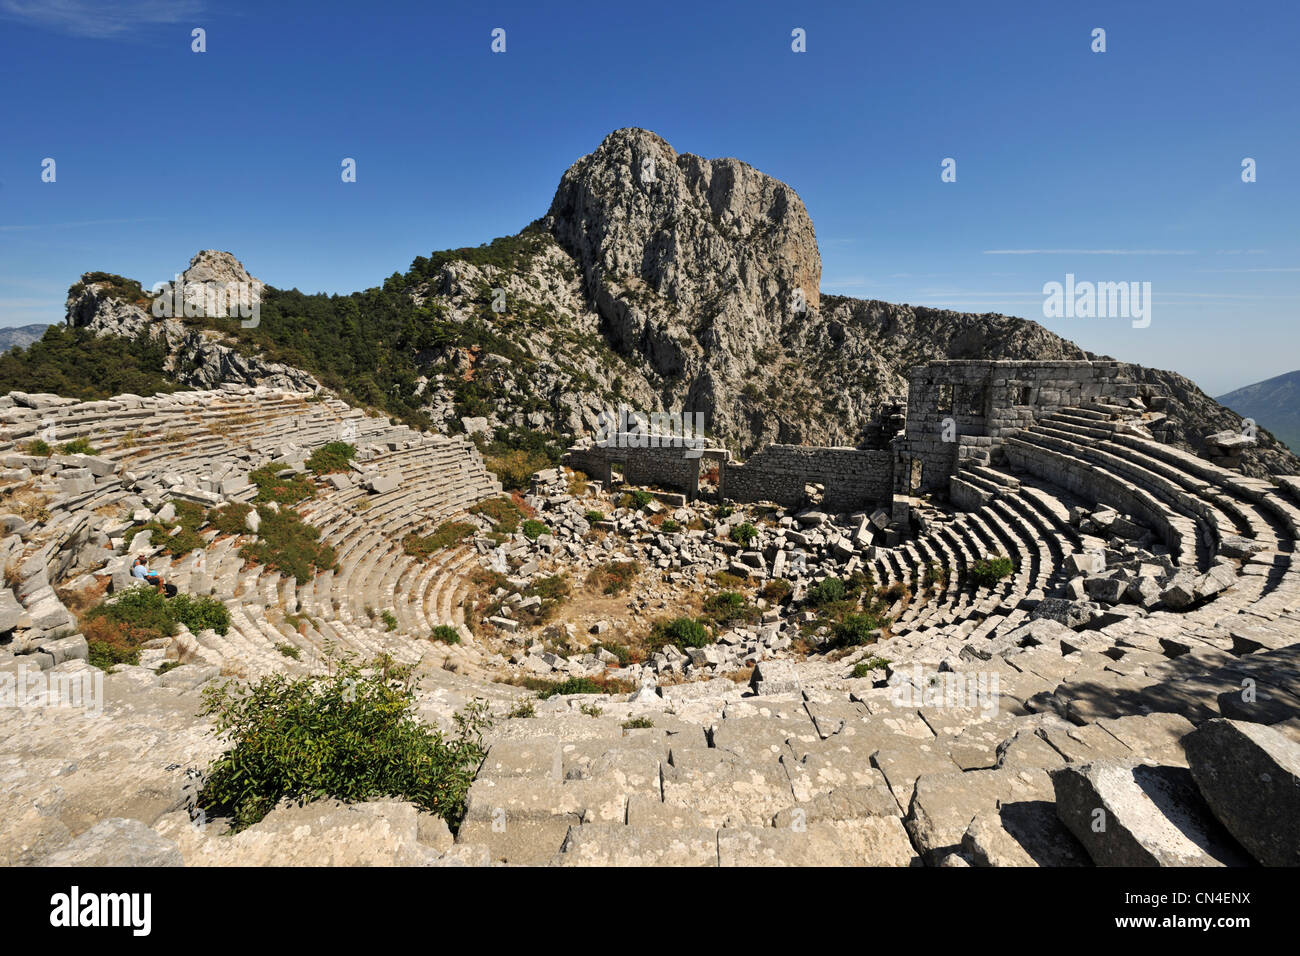 Turkey, Mediterranean Region, Turquoise Coast, Pamphylia, Termessos site, the theatre - Stock Image